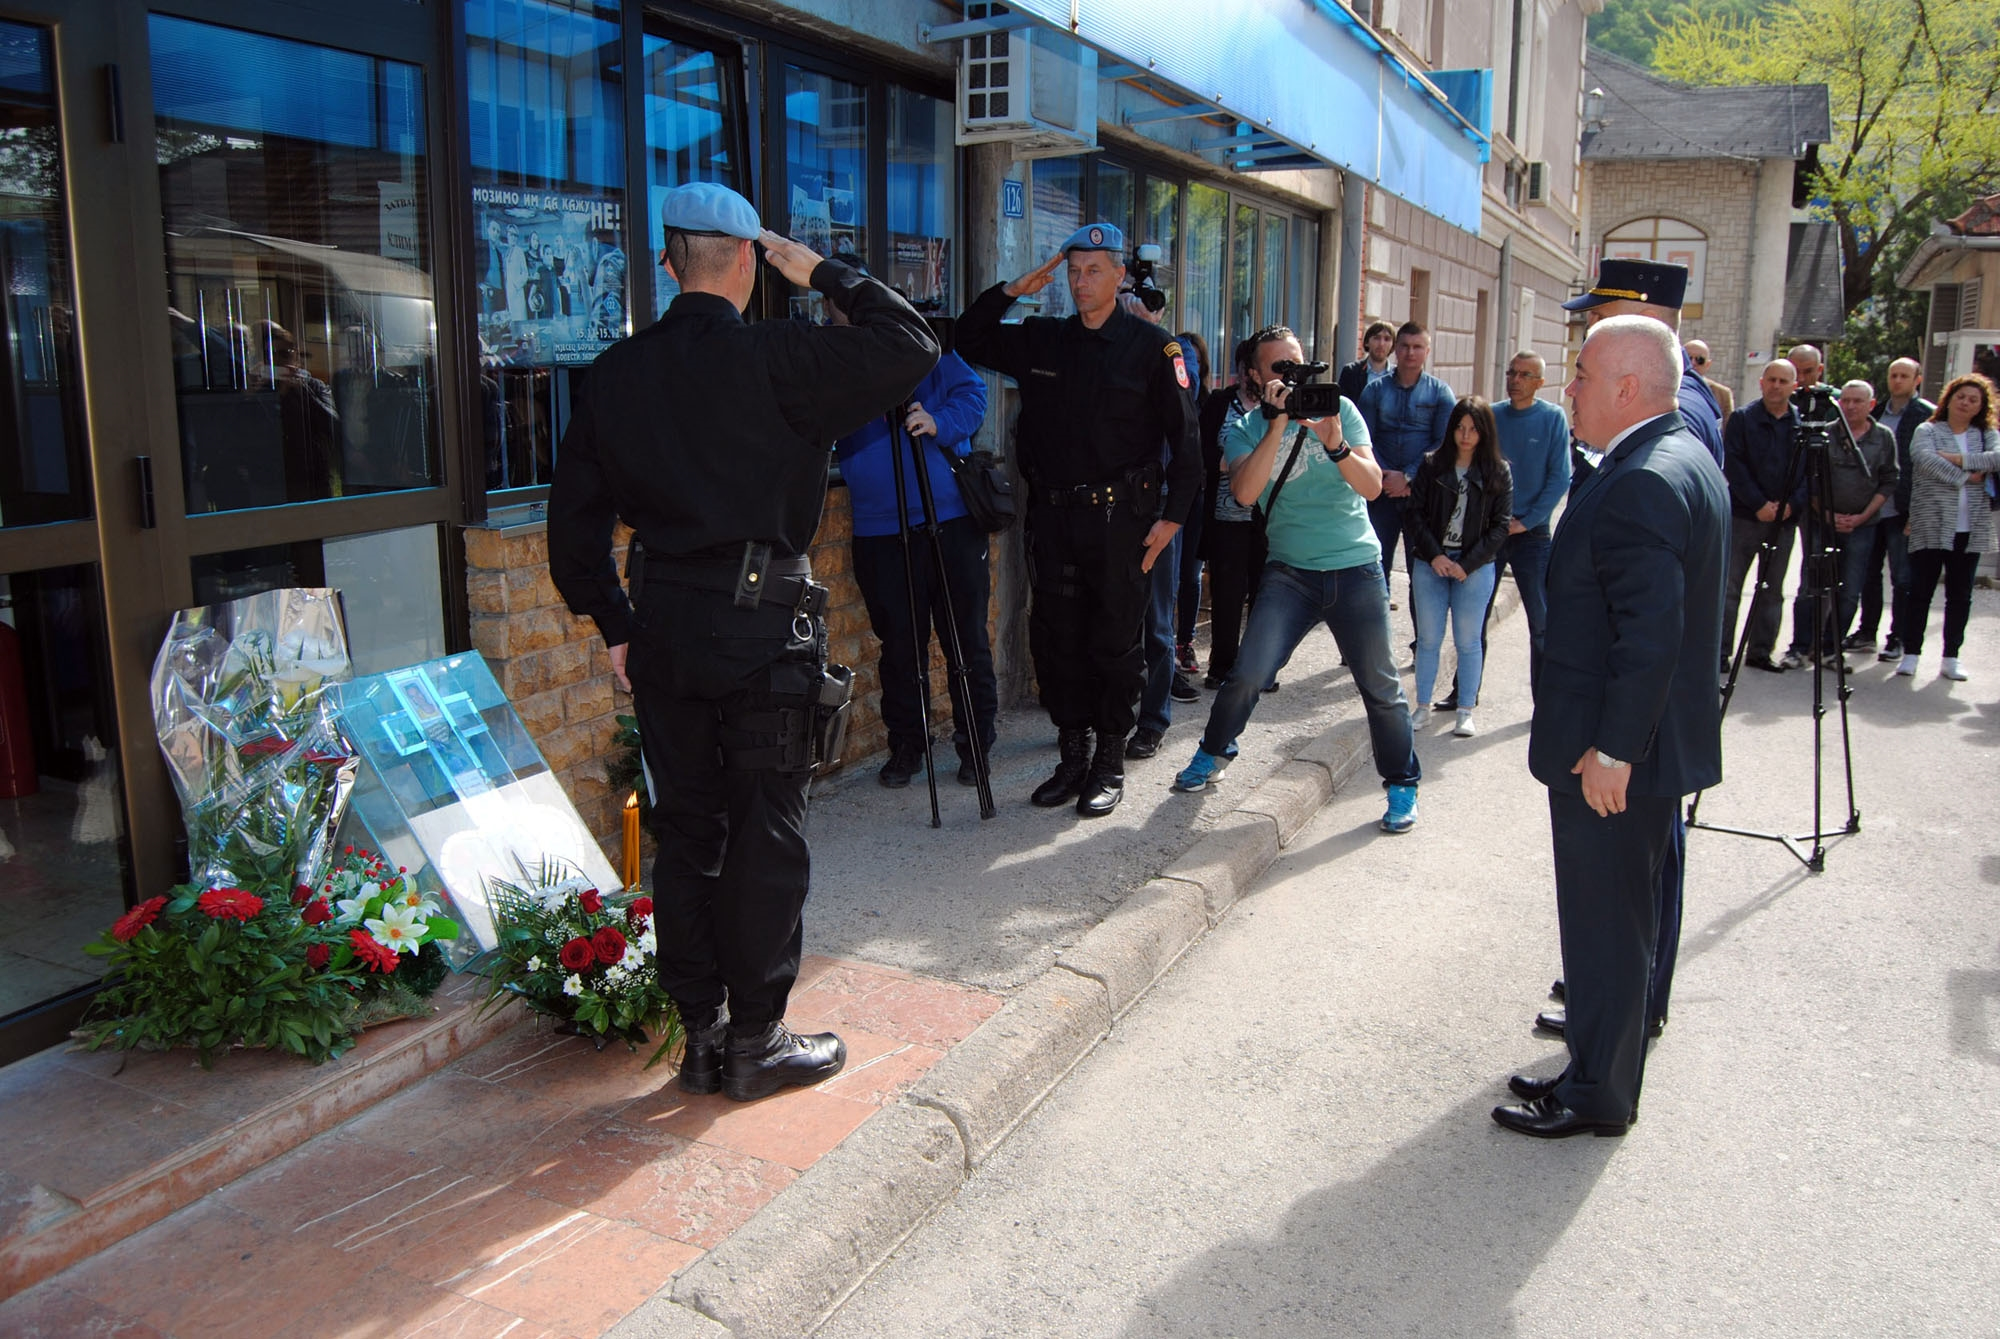 Culum: Terrorist threat is real in BiH